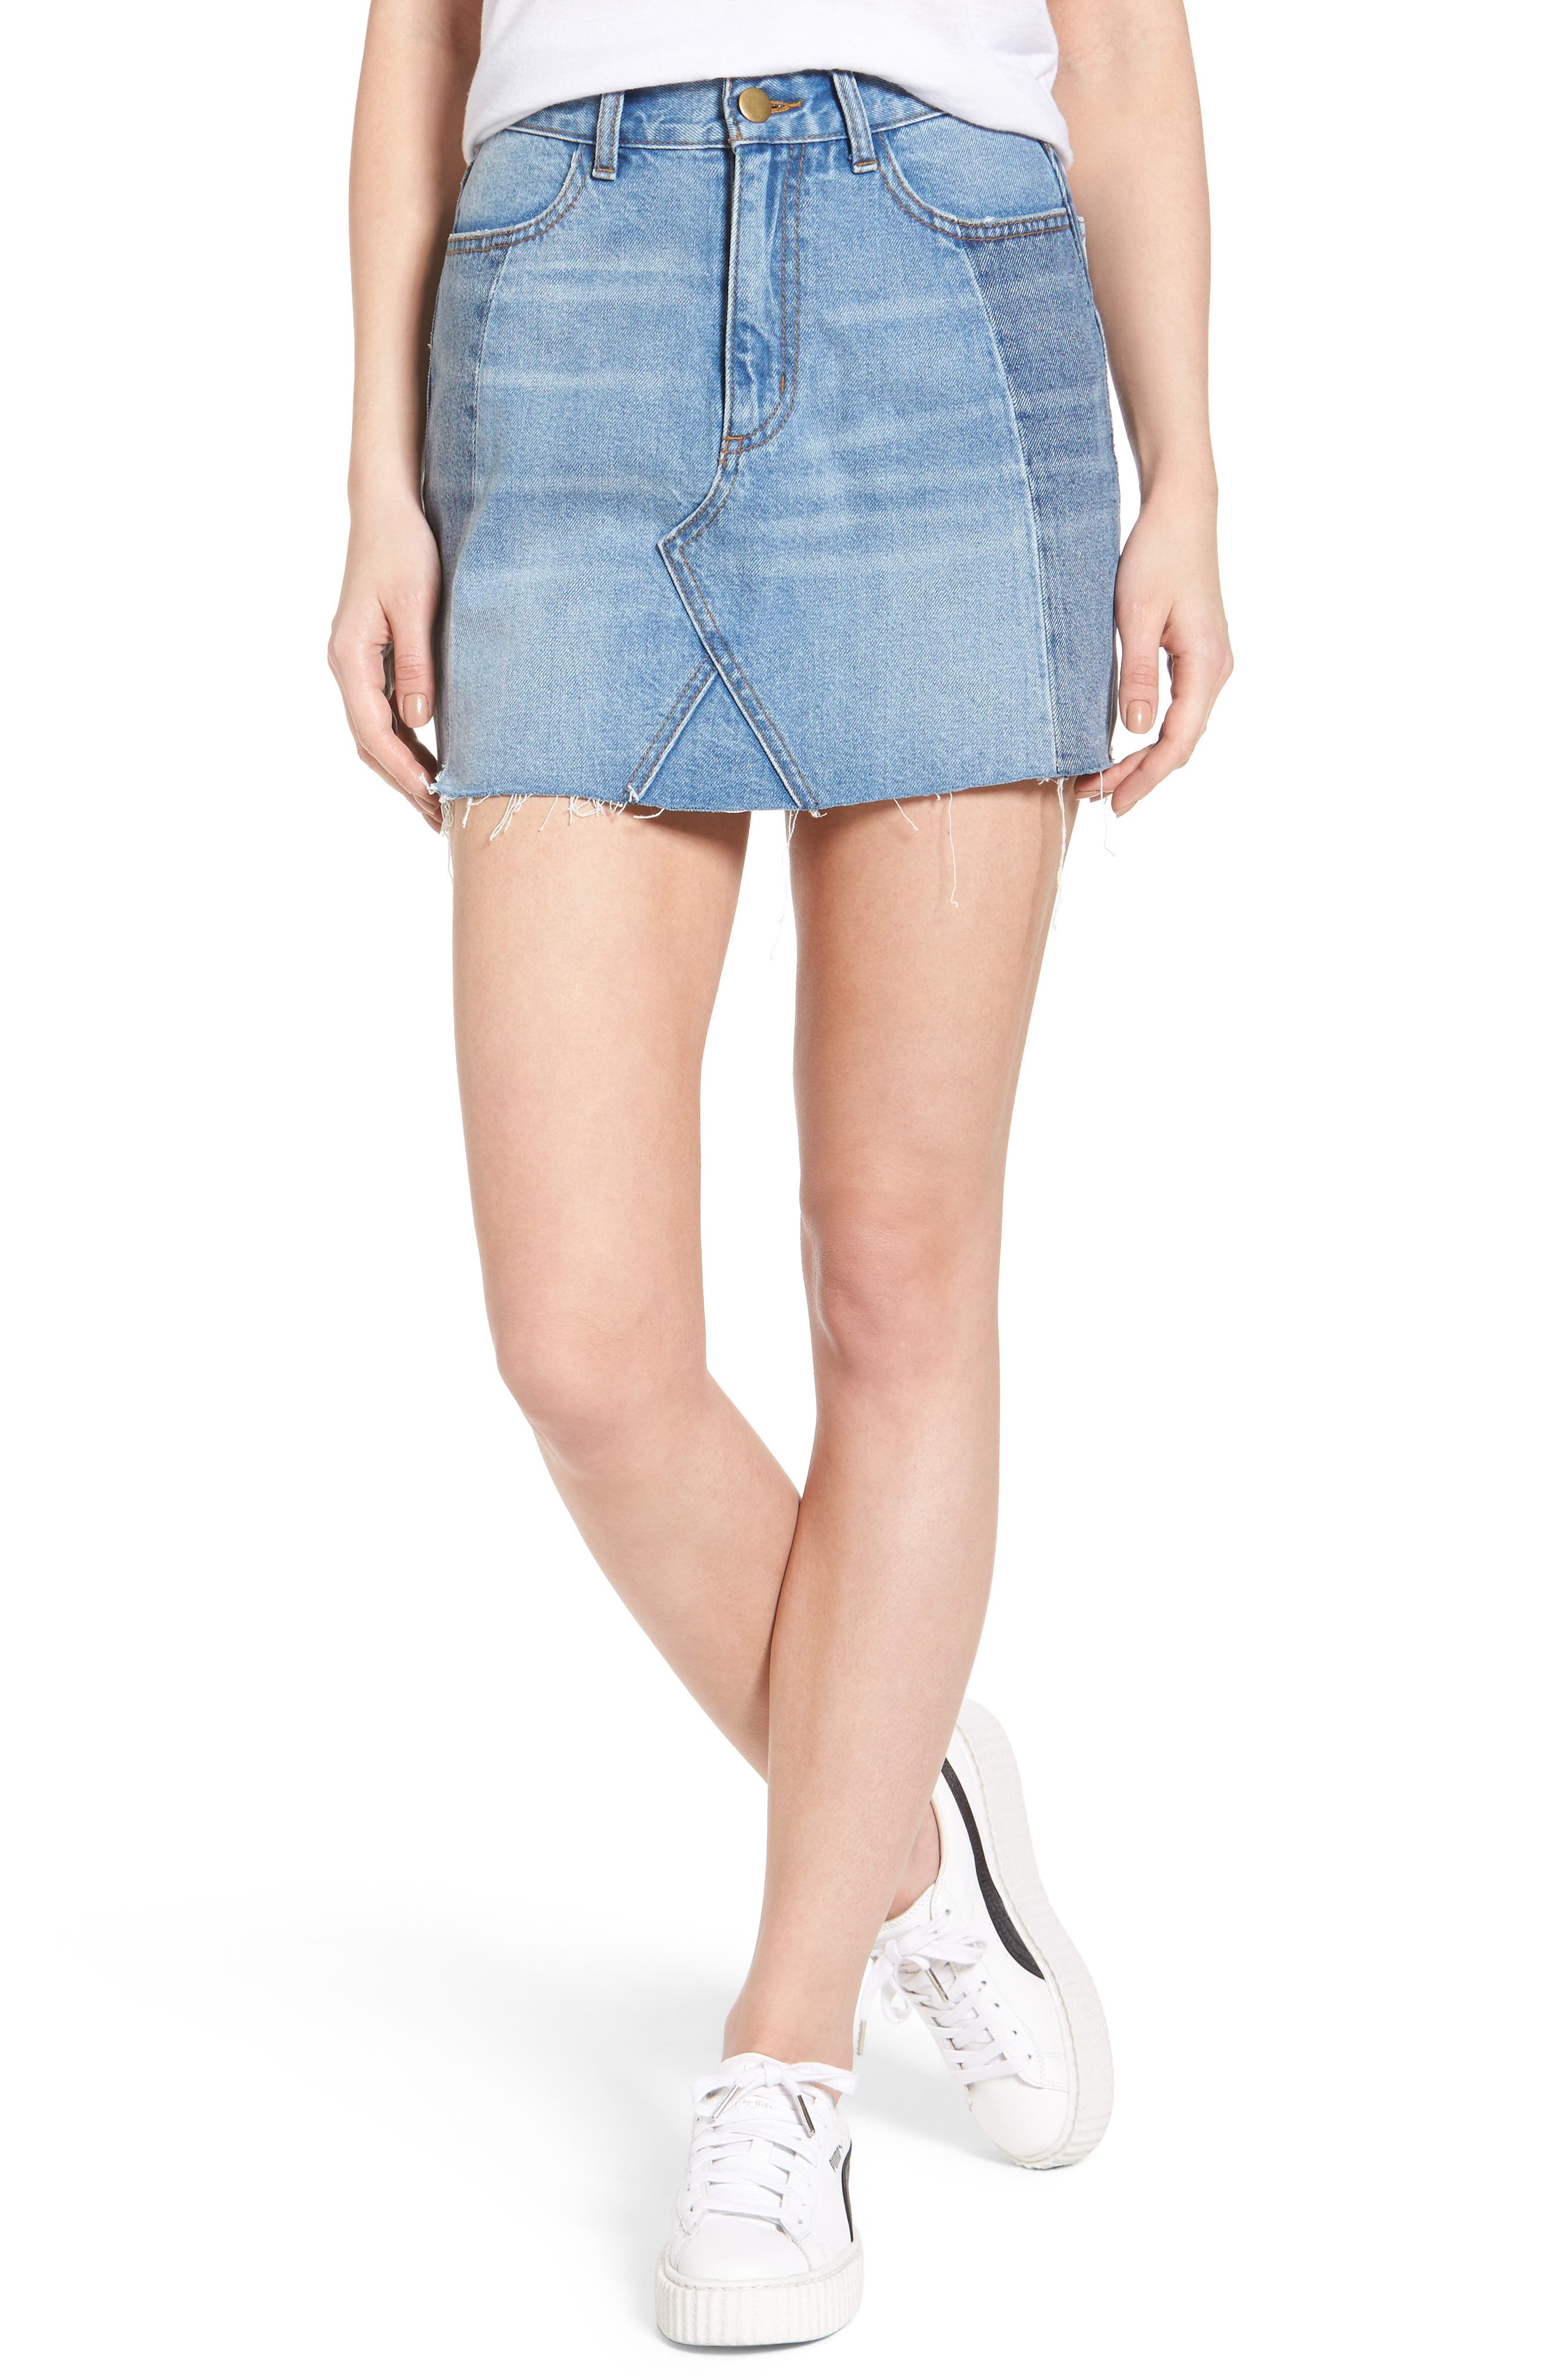 EVIDNT Patchwork Denim Miniskirt